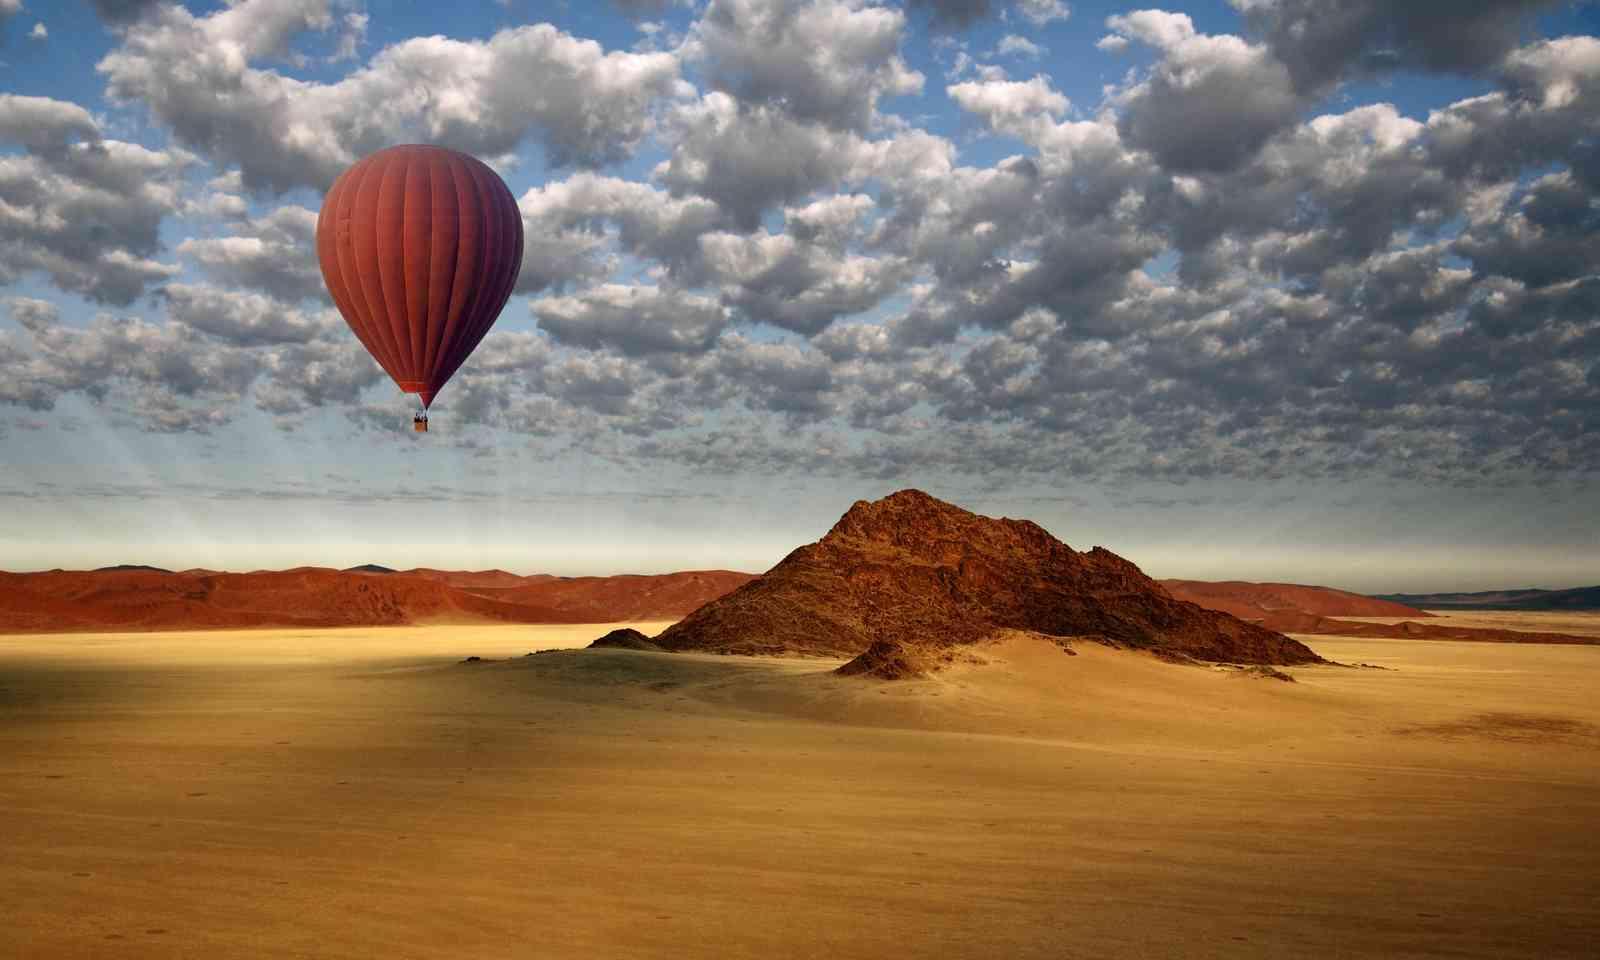 Hot Air Balloon in the Namib-Naukluft Desert (Dreamstime)